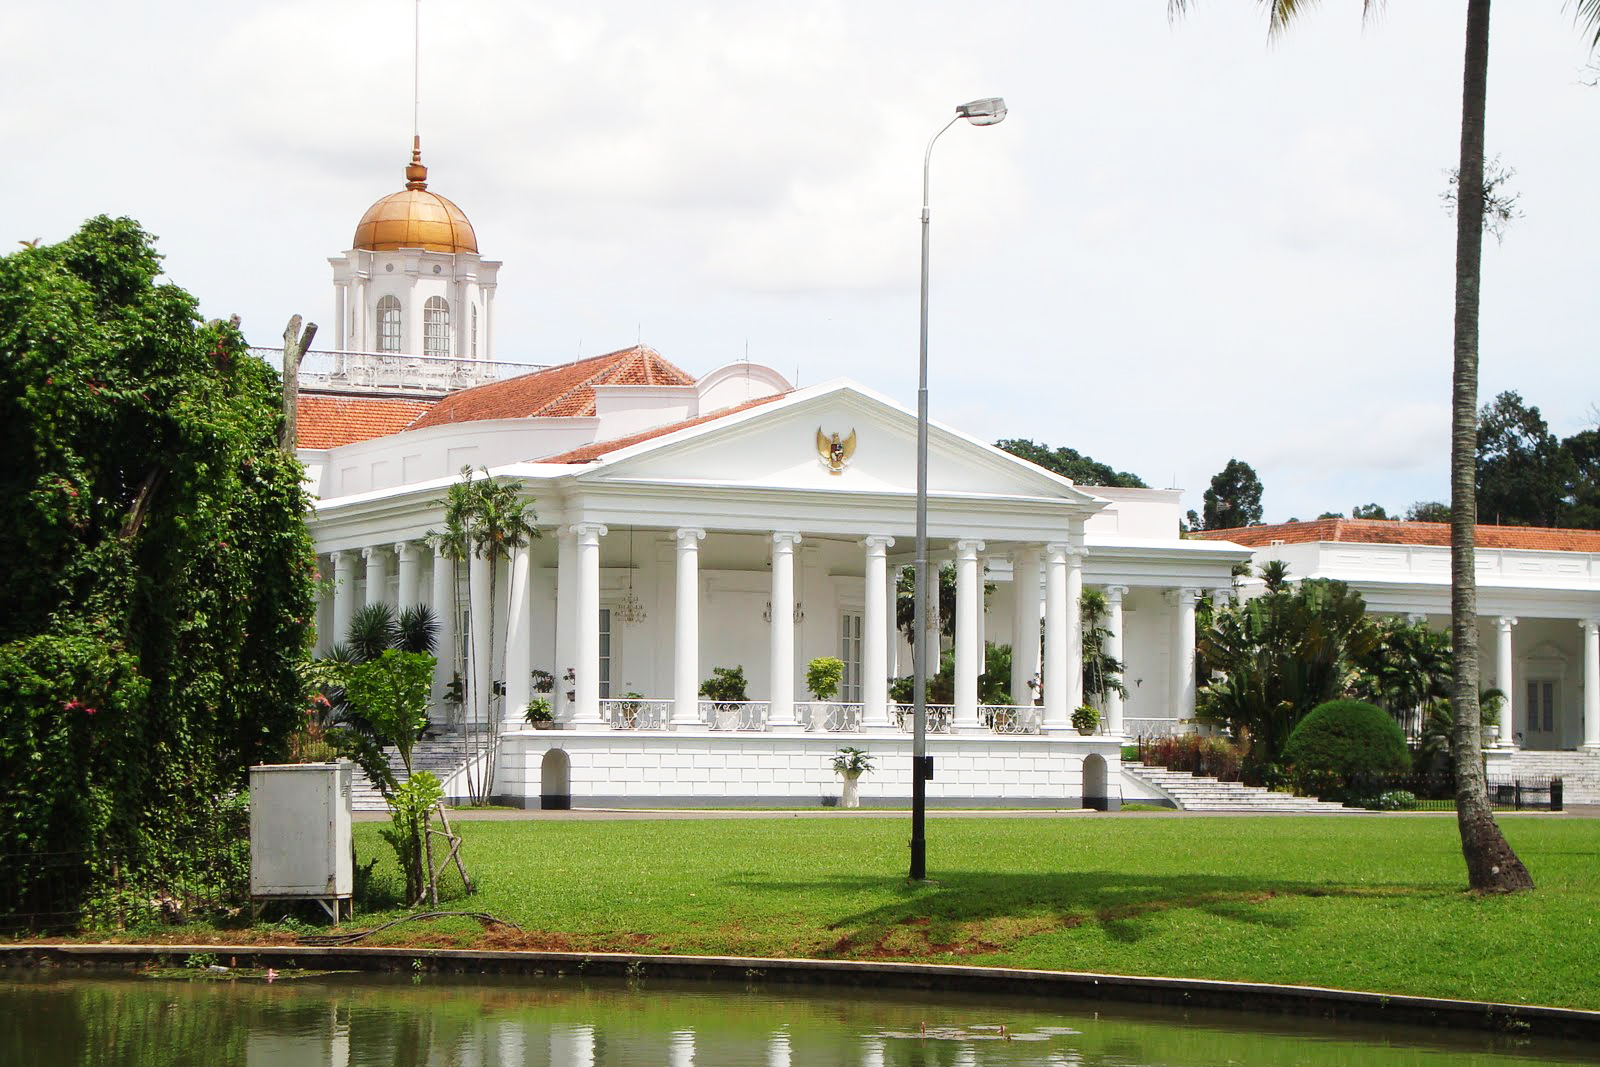 Bangunan Tua di Bogor